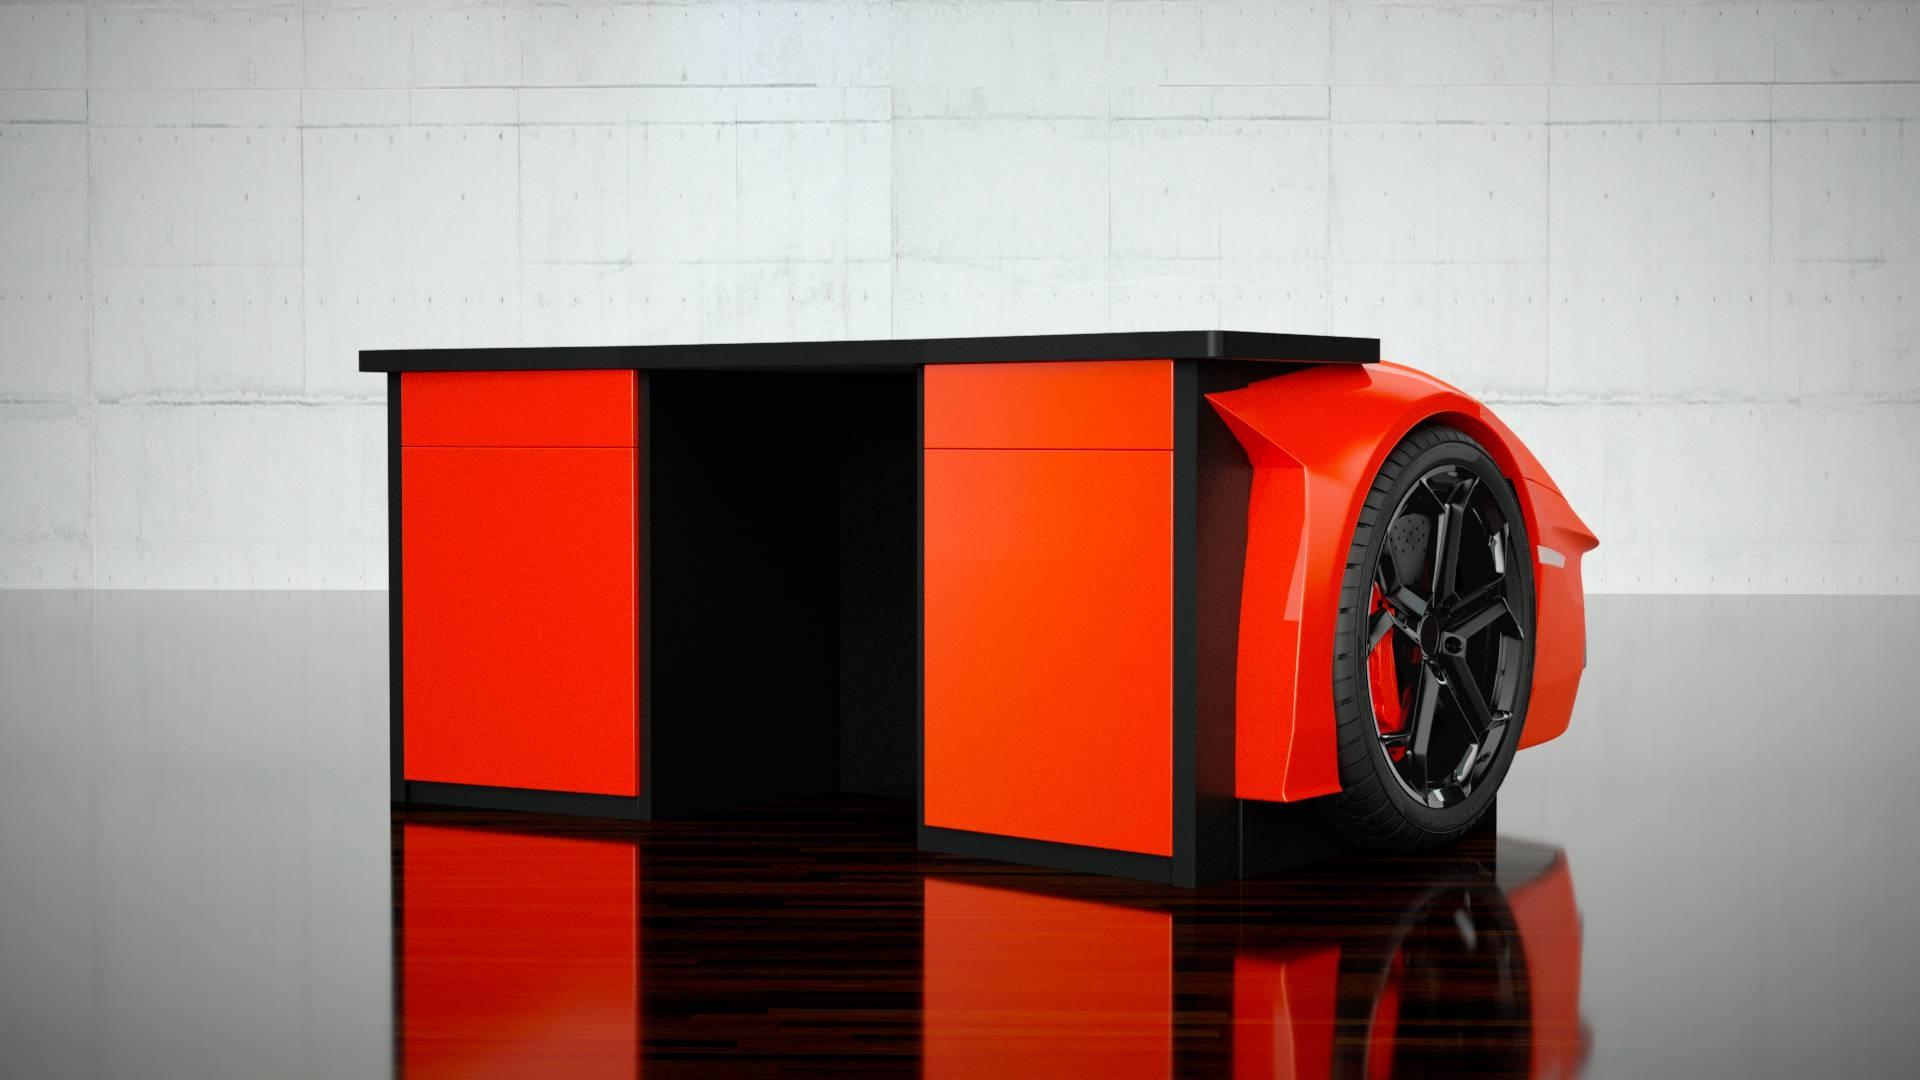 Aventador Bureau Vous Lamborghini Offrez Un rECxdBoeQW